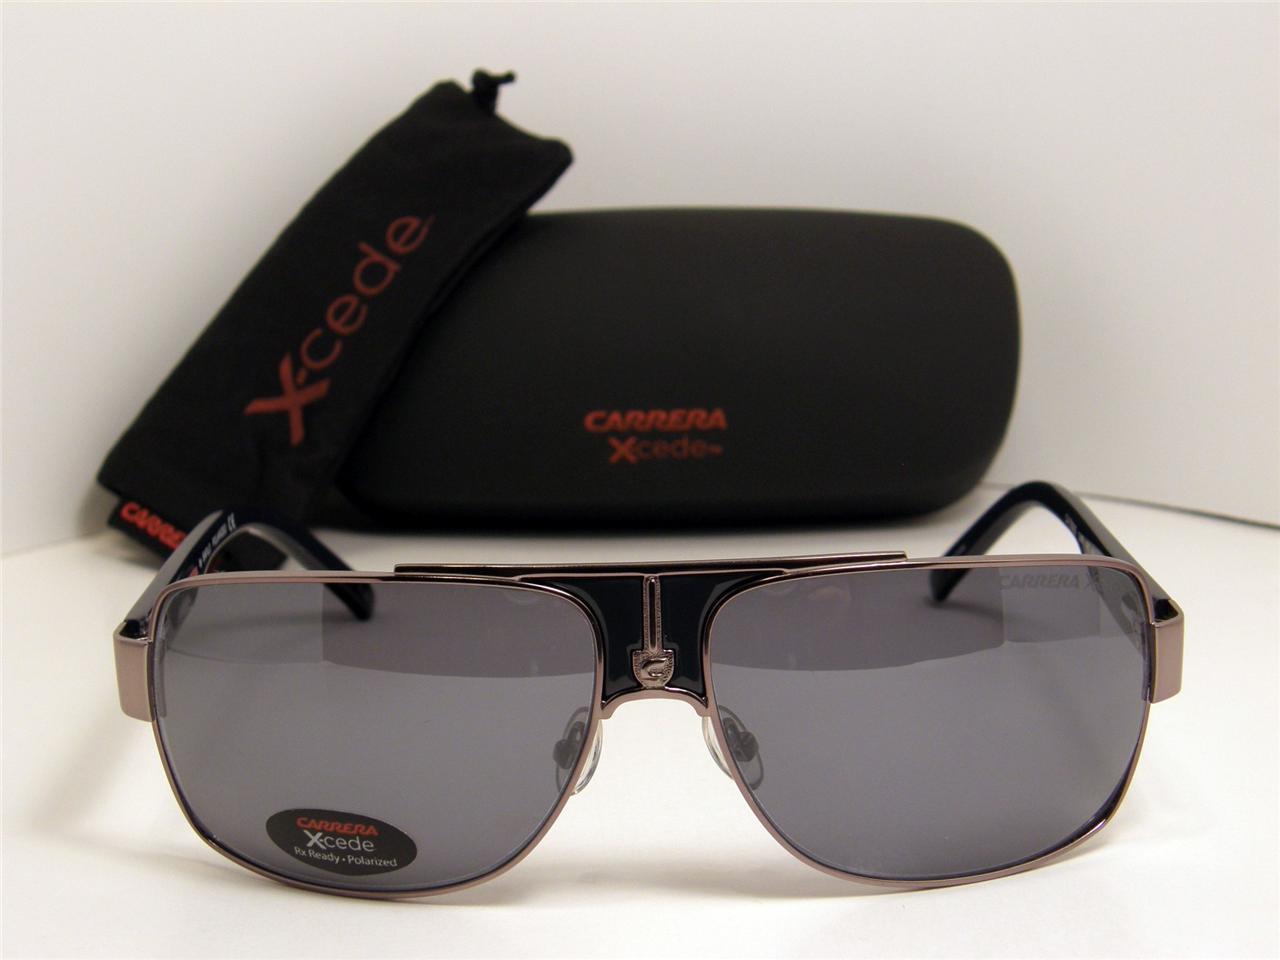 e629dc0c78aeb New Authentic Carrera Sunglasses X-Cede 7000 S 1J1PRT 62mm CA 7000 S 1J1P  RT -  87.08